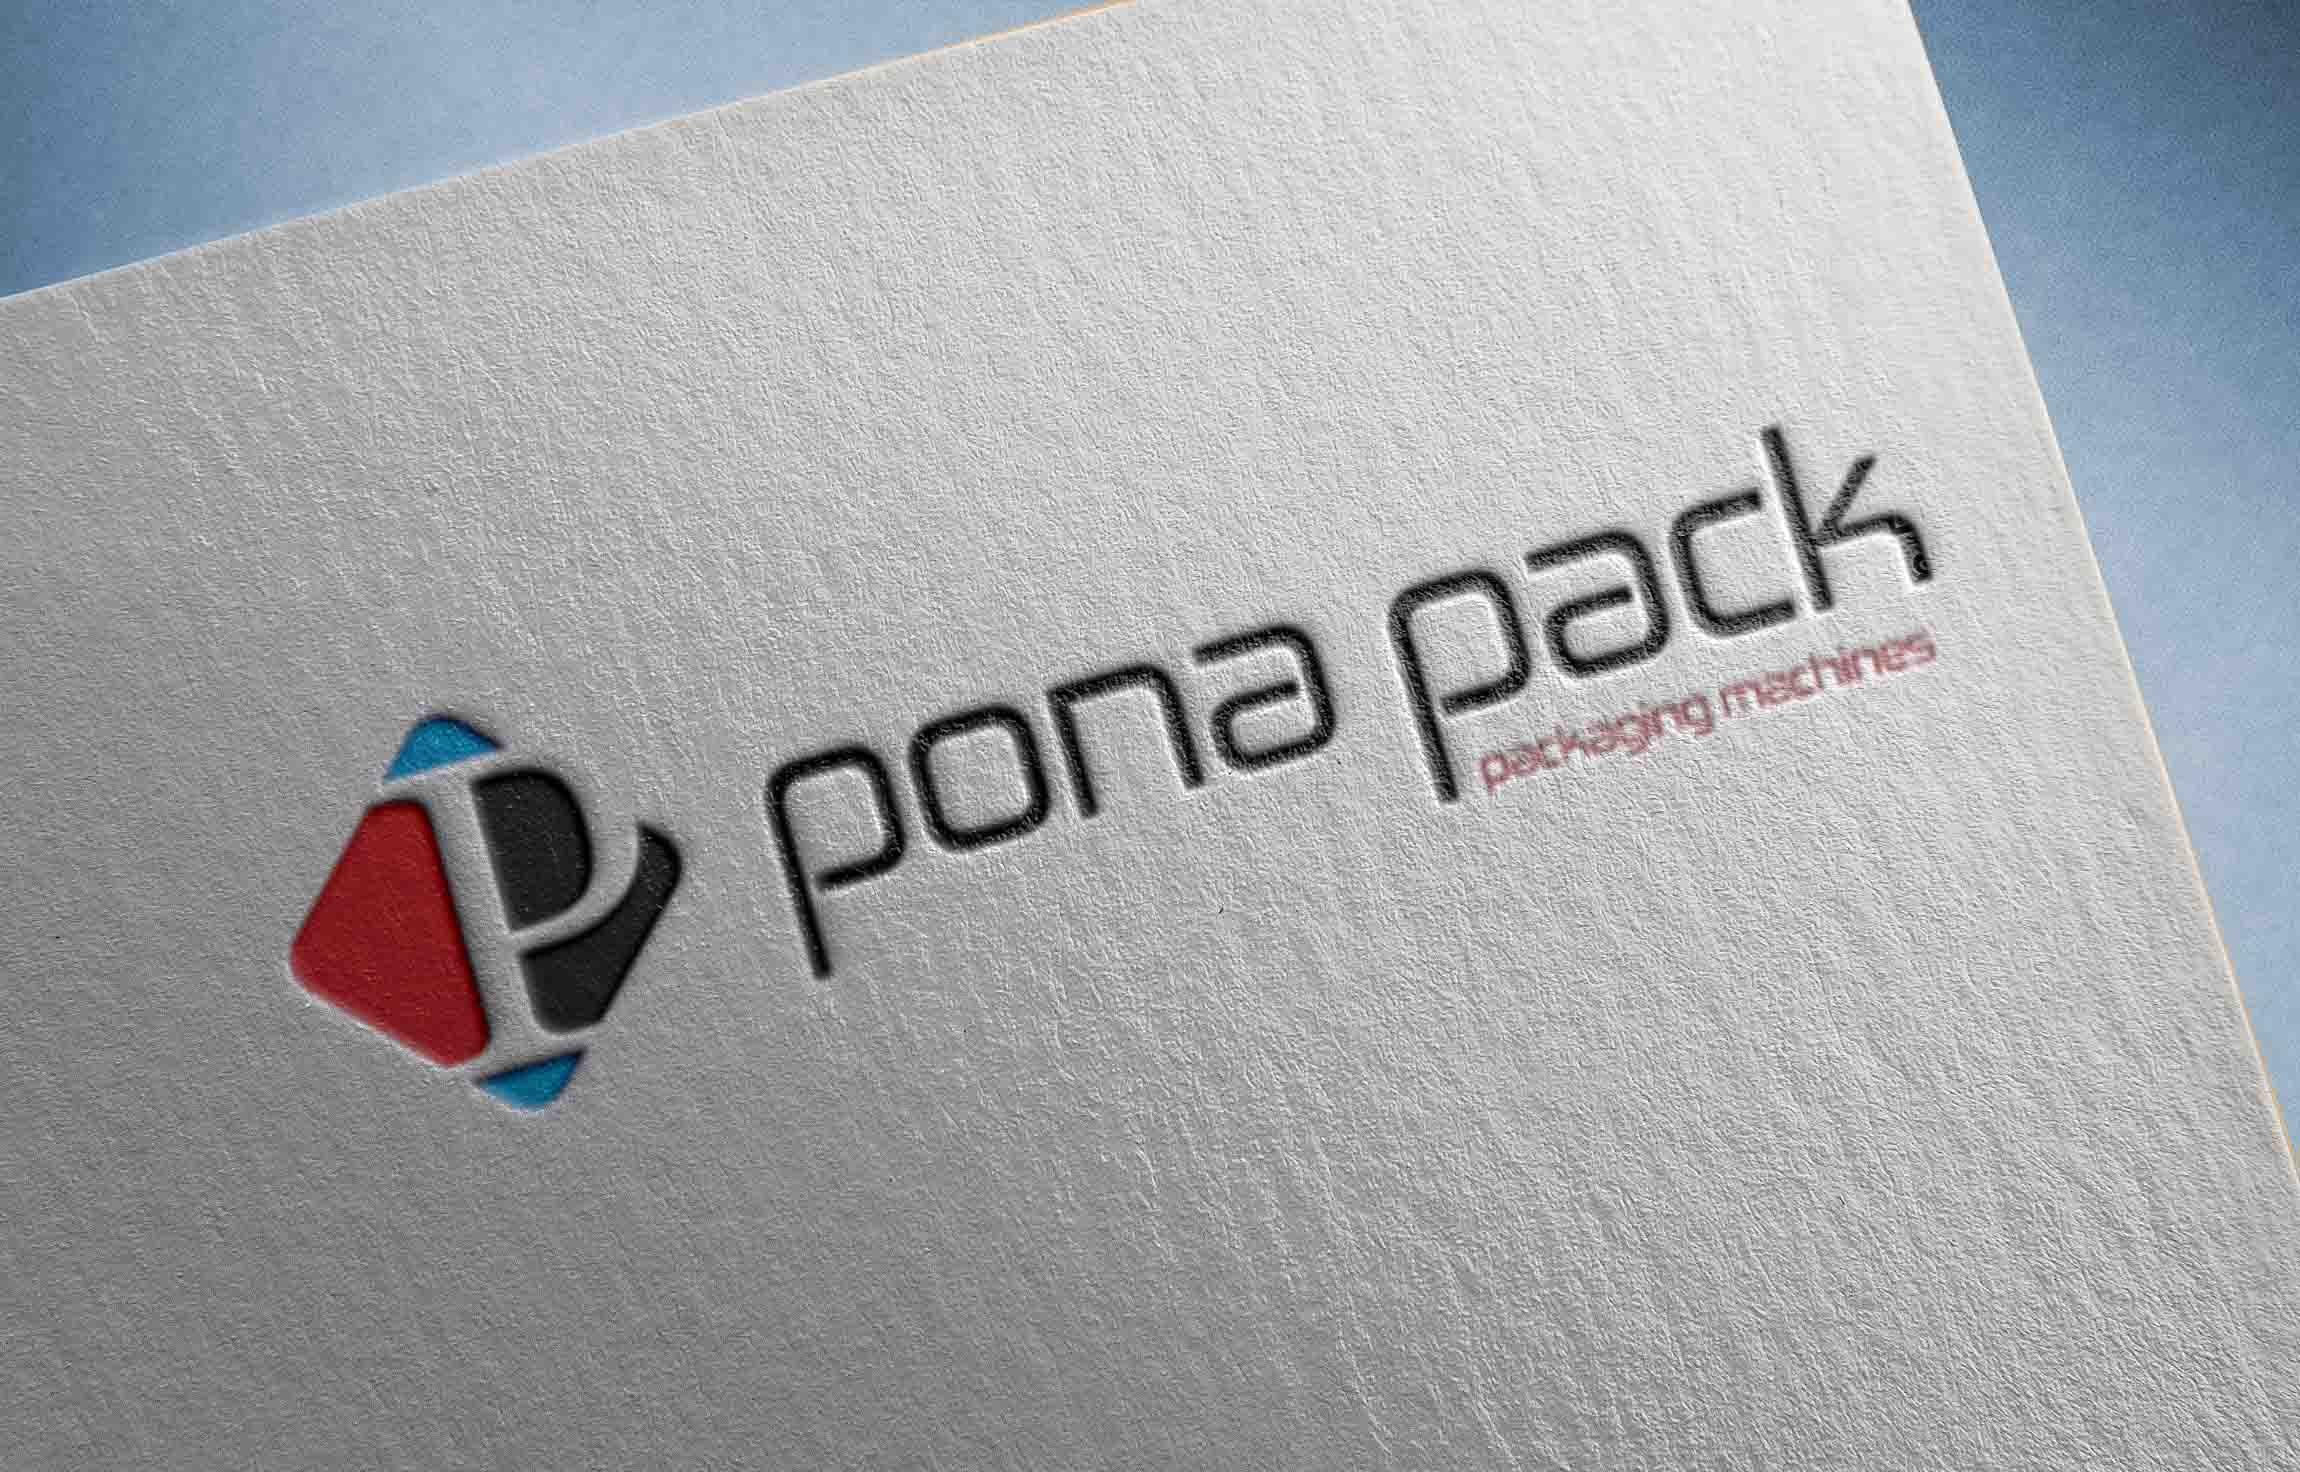 https://rdmedya.com/wp-content/uploads/2020/04/ponapack-logo-tasarim.jpg